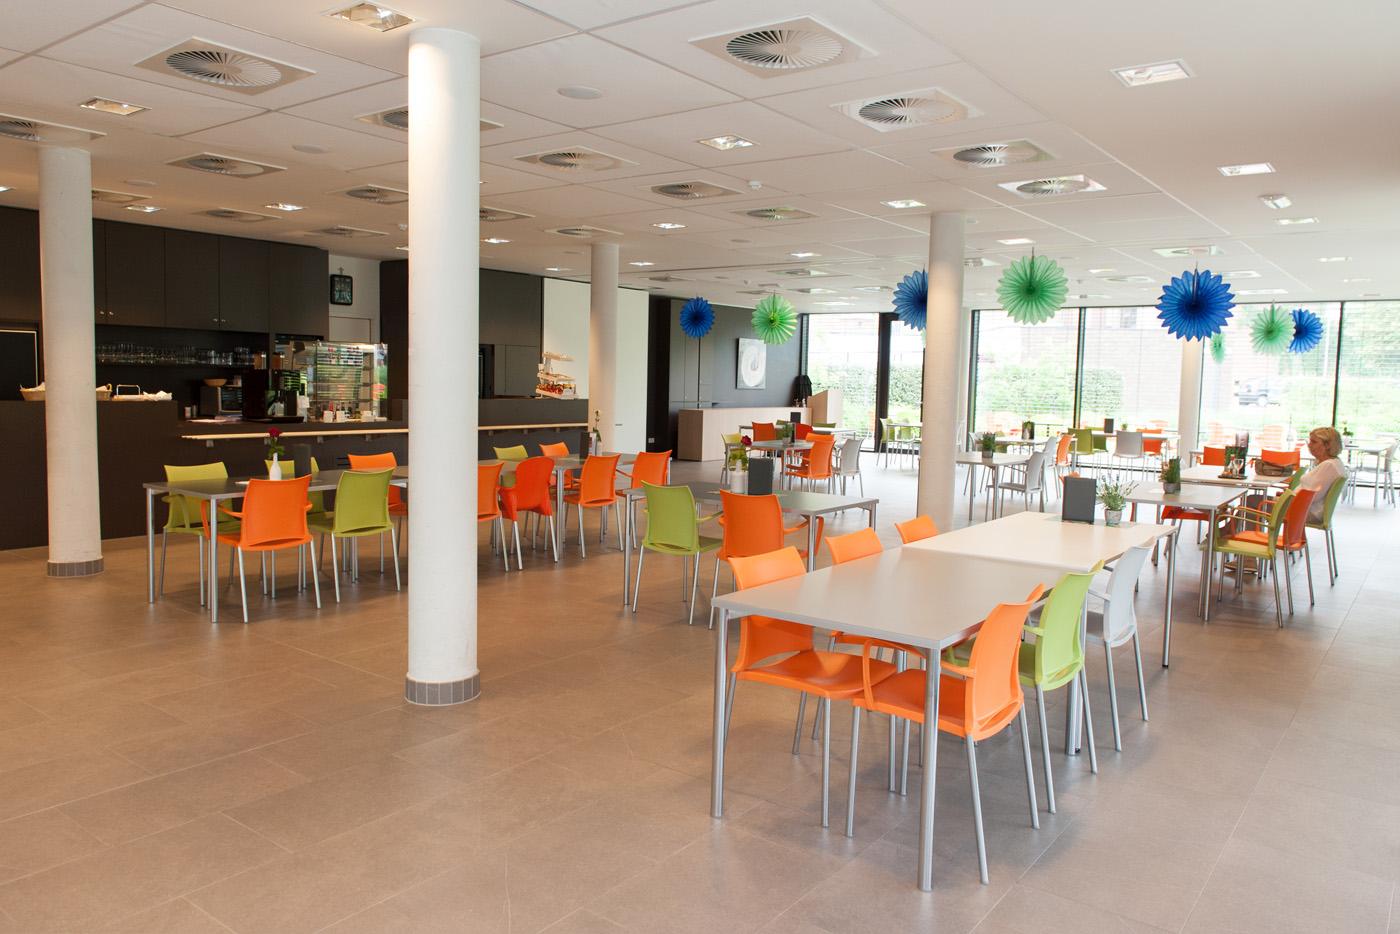 Woonzorgcentrum Dendermonde Mariatroon cafetaria